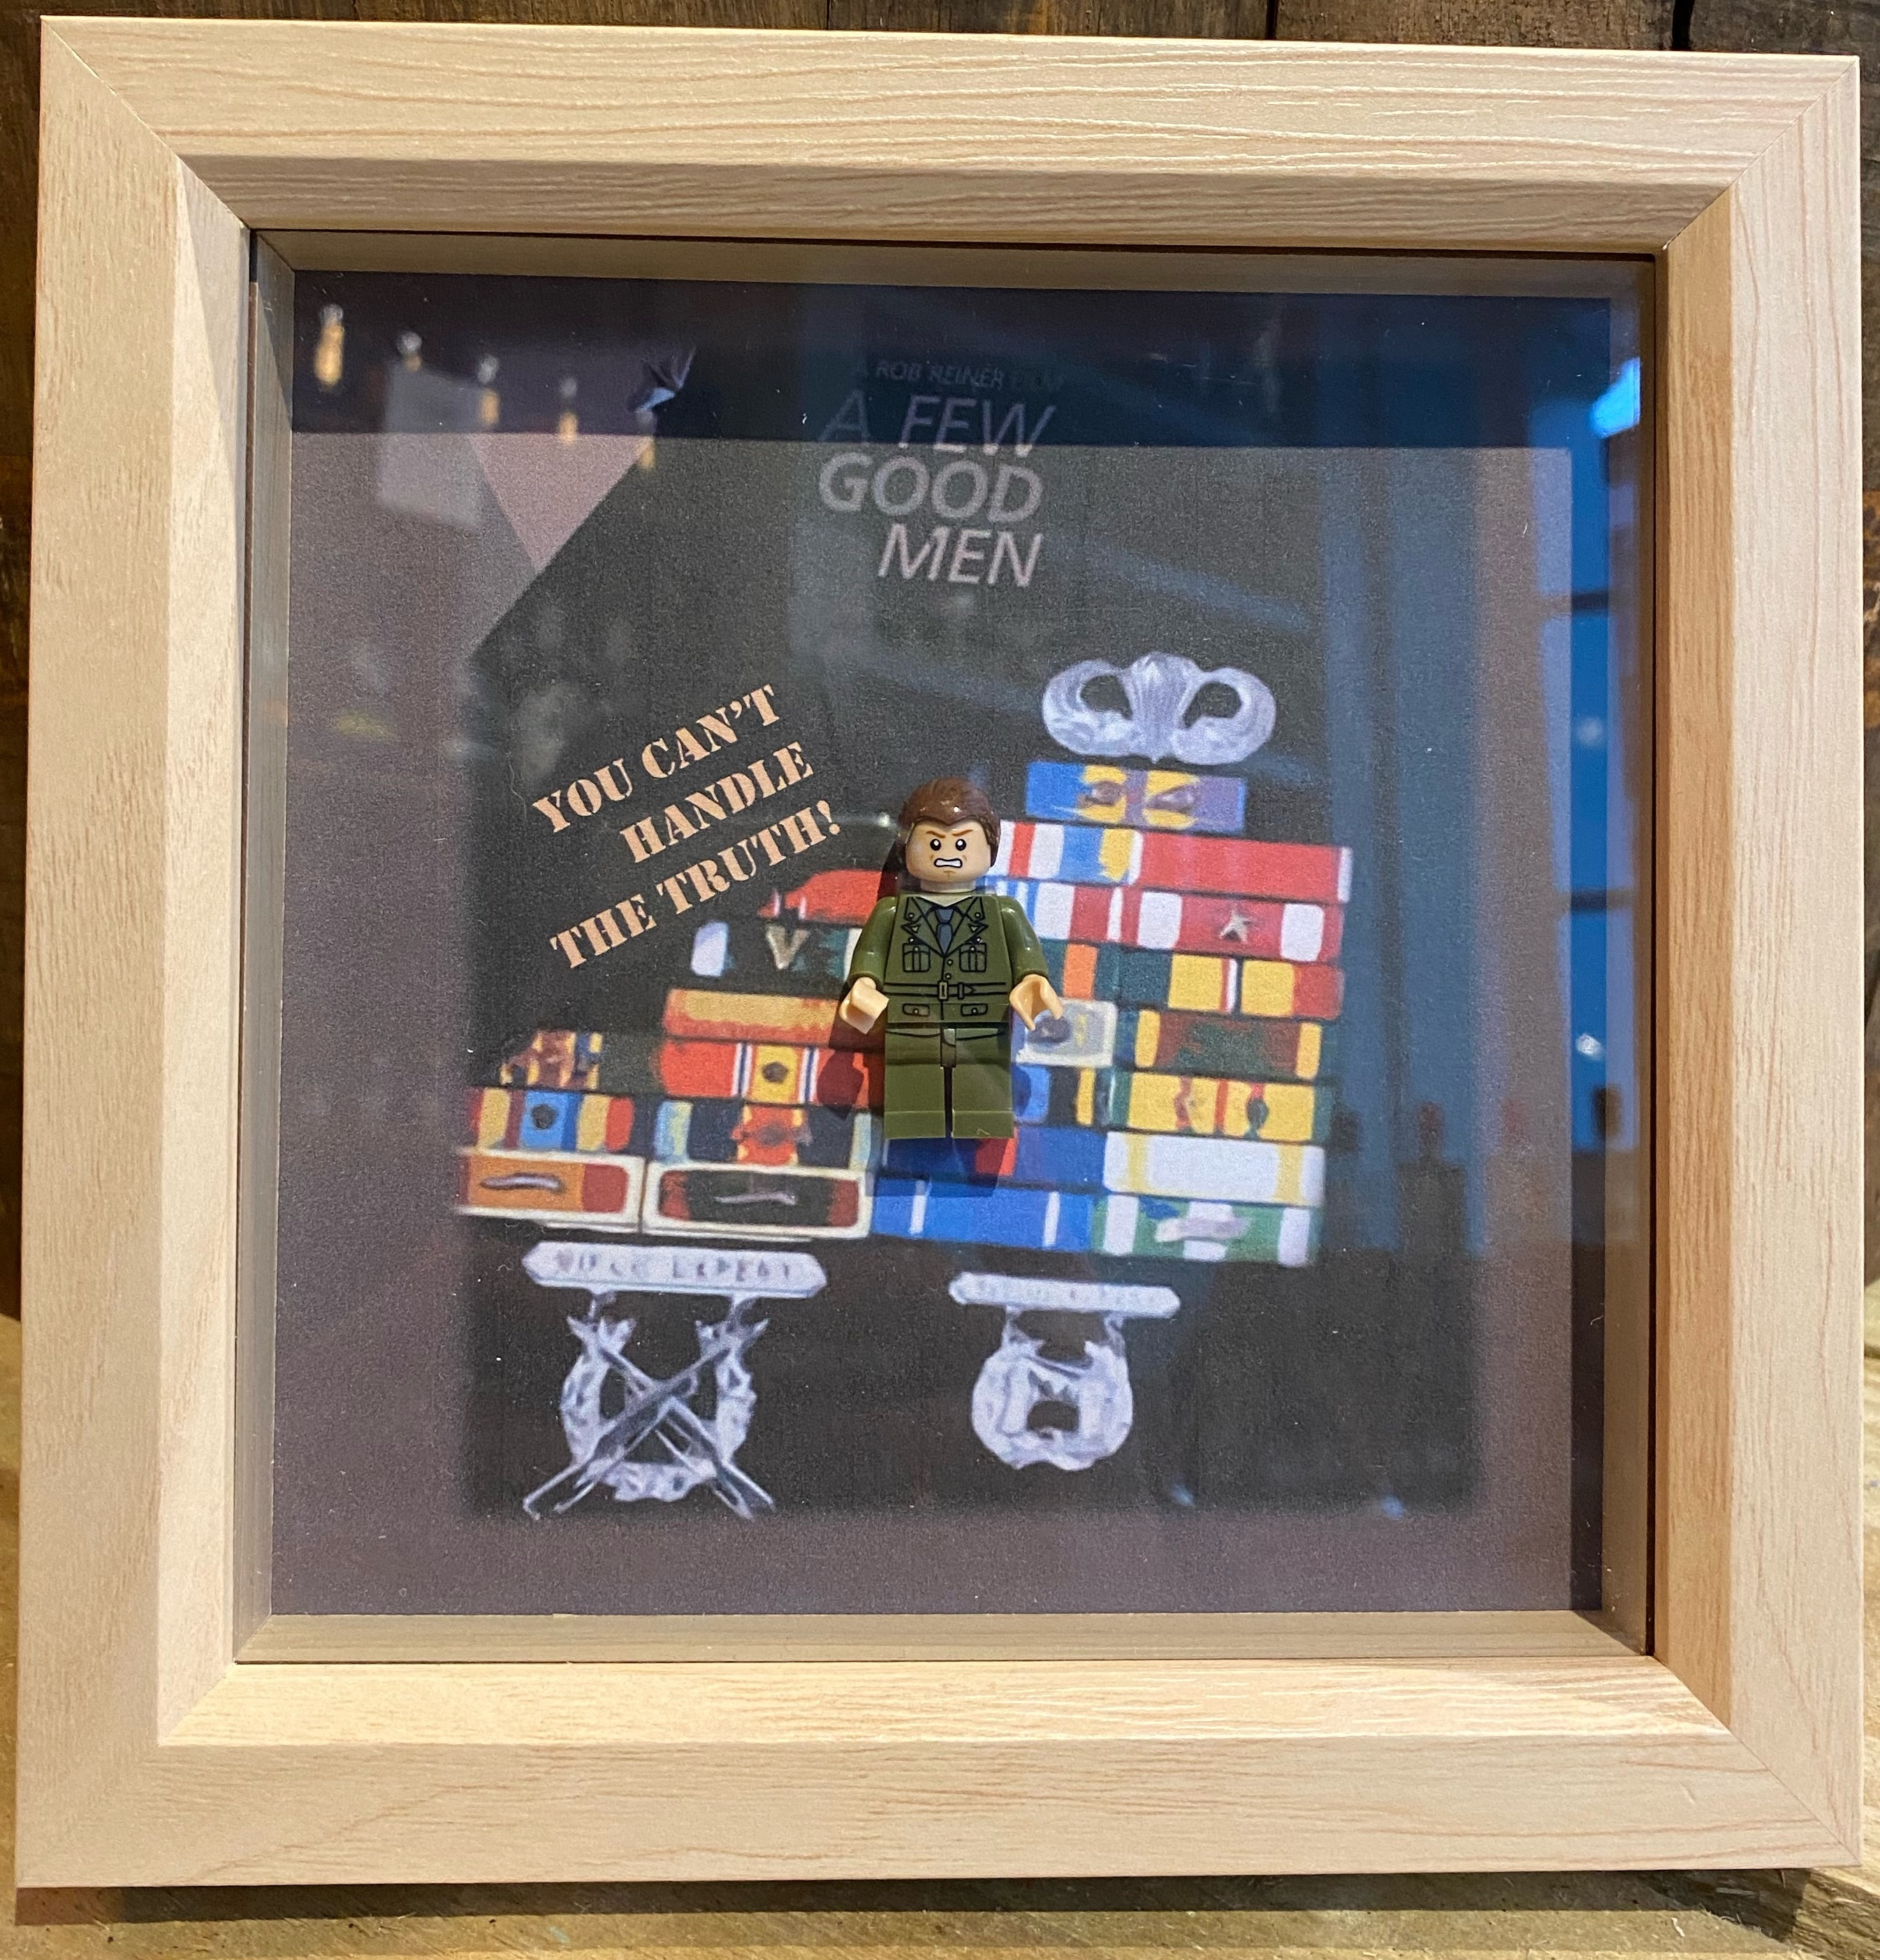 Lego Art - A few good men